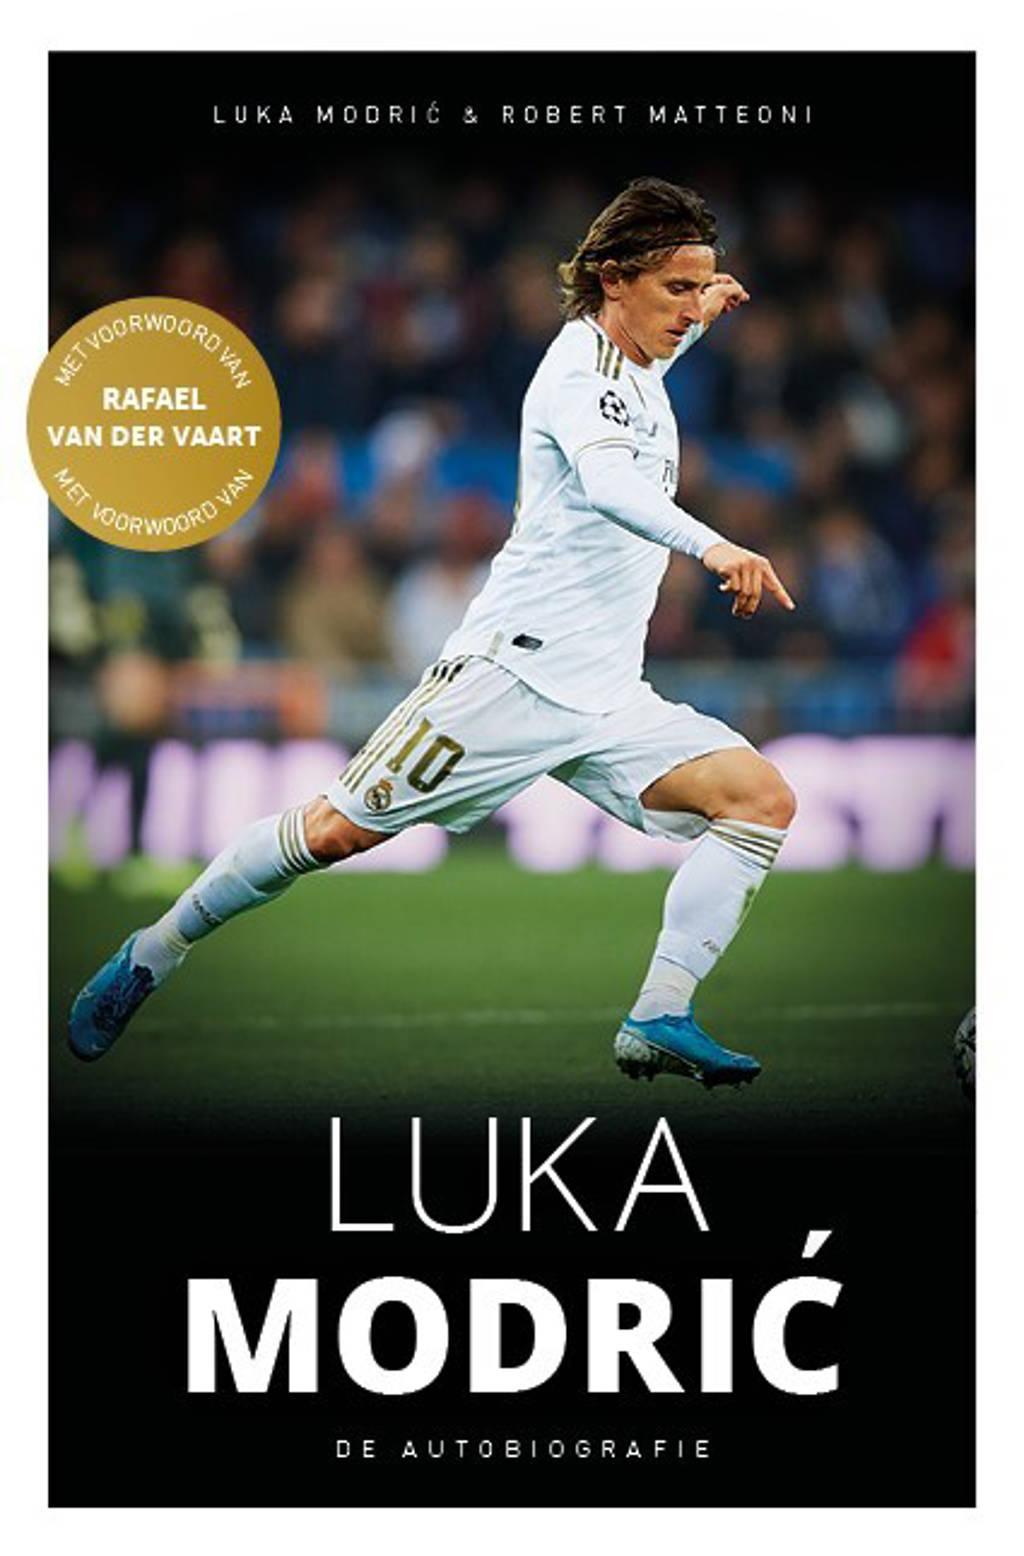 Luka Modric - de autobiografie - Luka Modric en Robert Matteoni